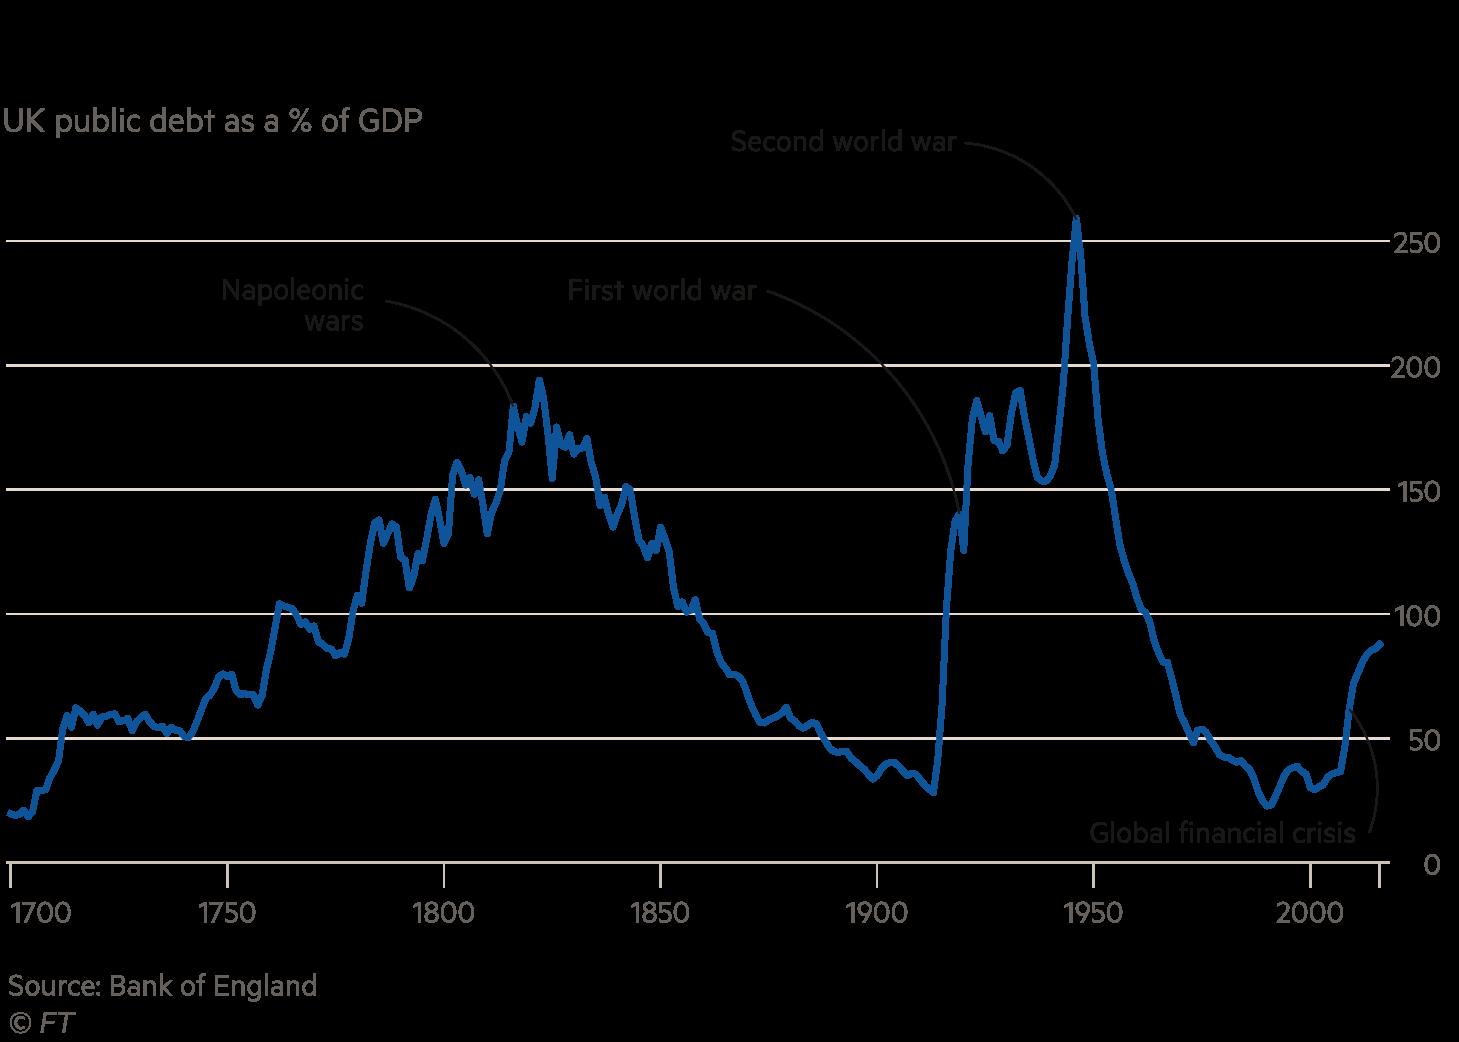 The 2007 financial crisis hit the UK's finances hard